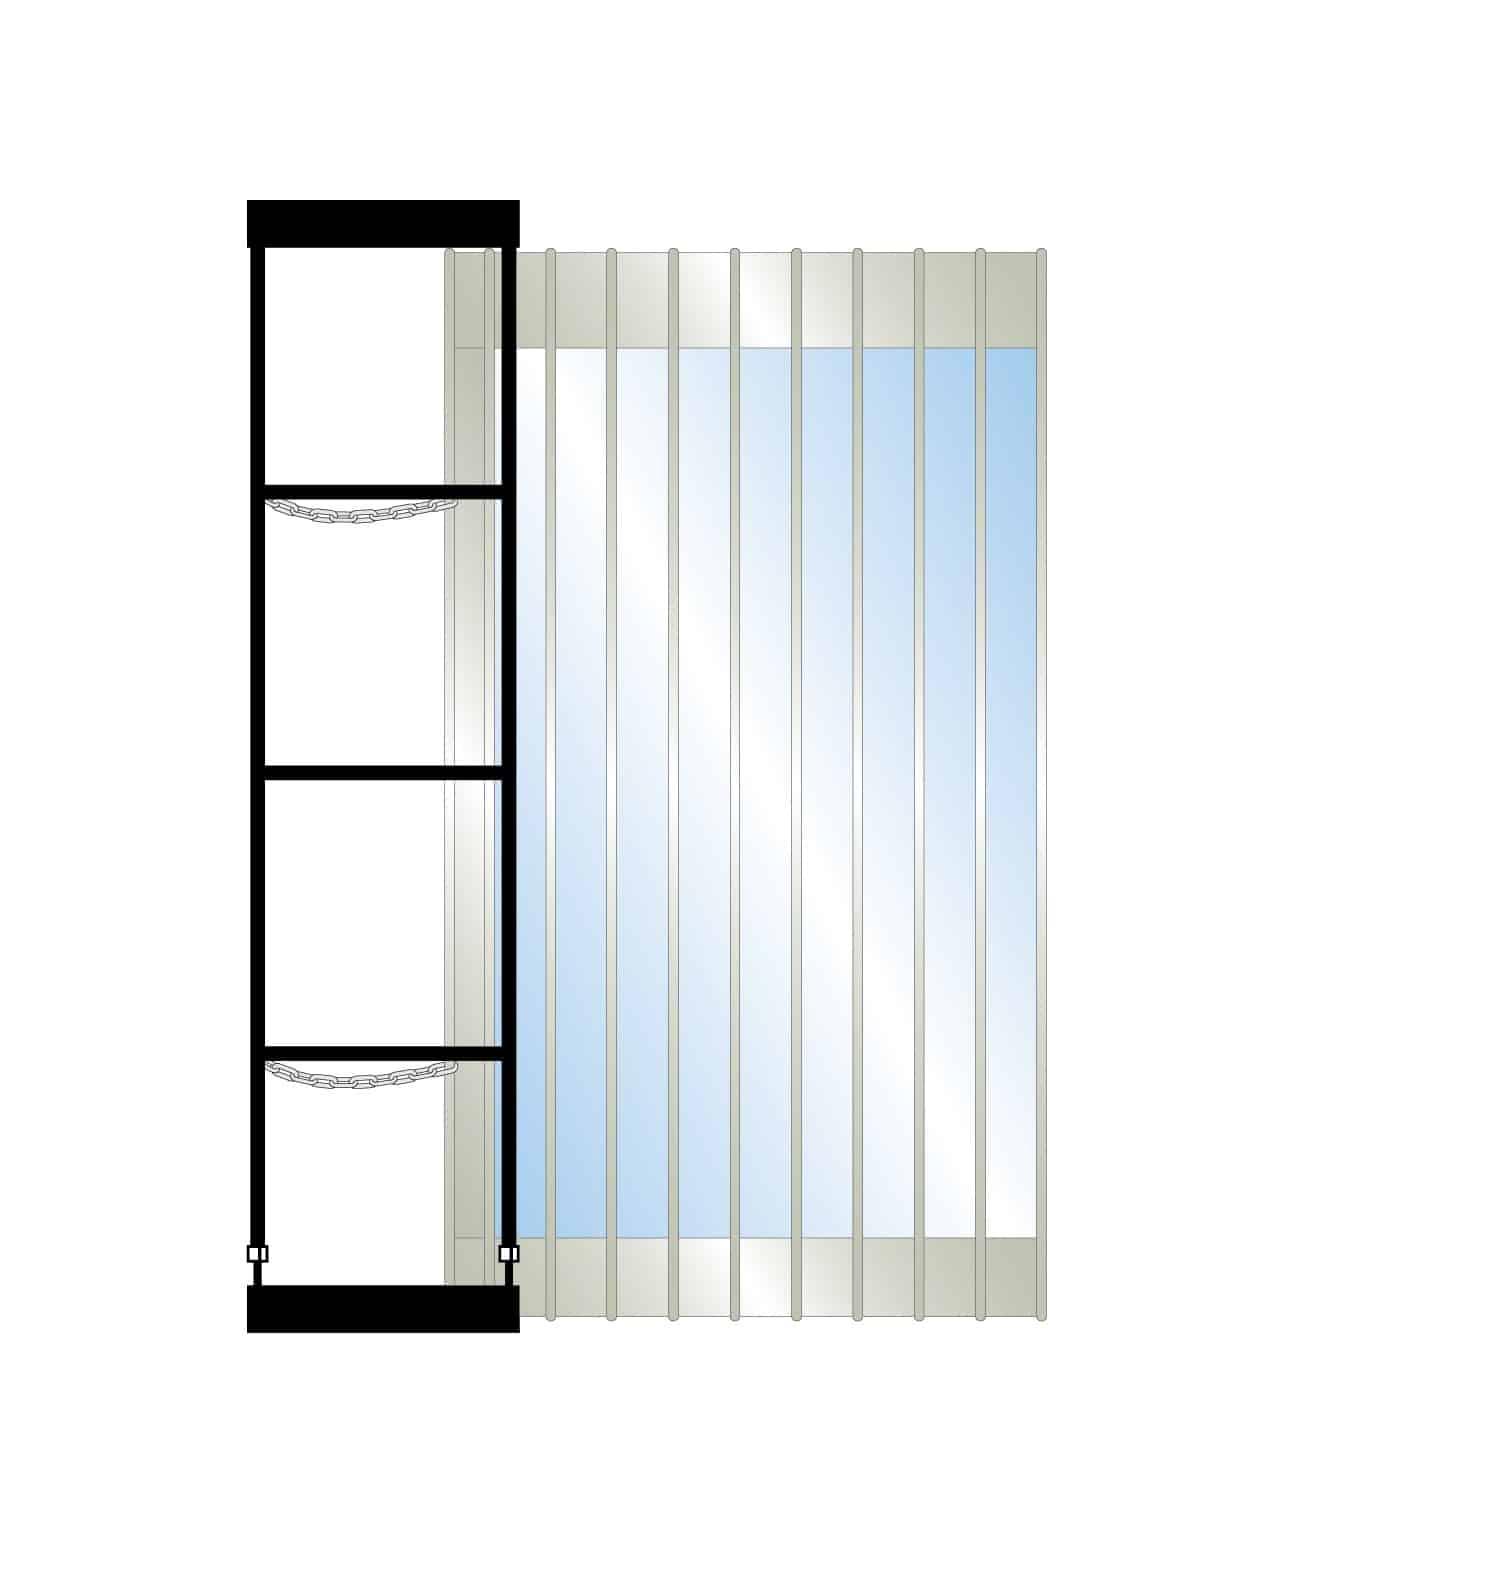 Ez Side Folding Security Grille Commercial Dynamic Closures